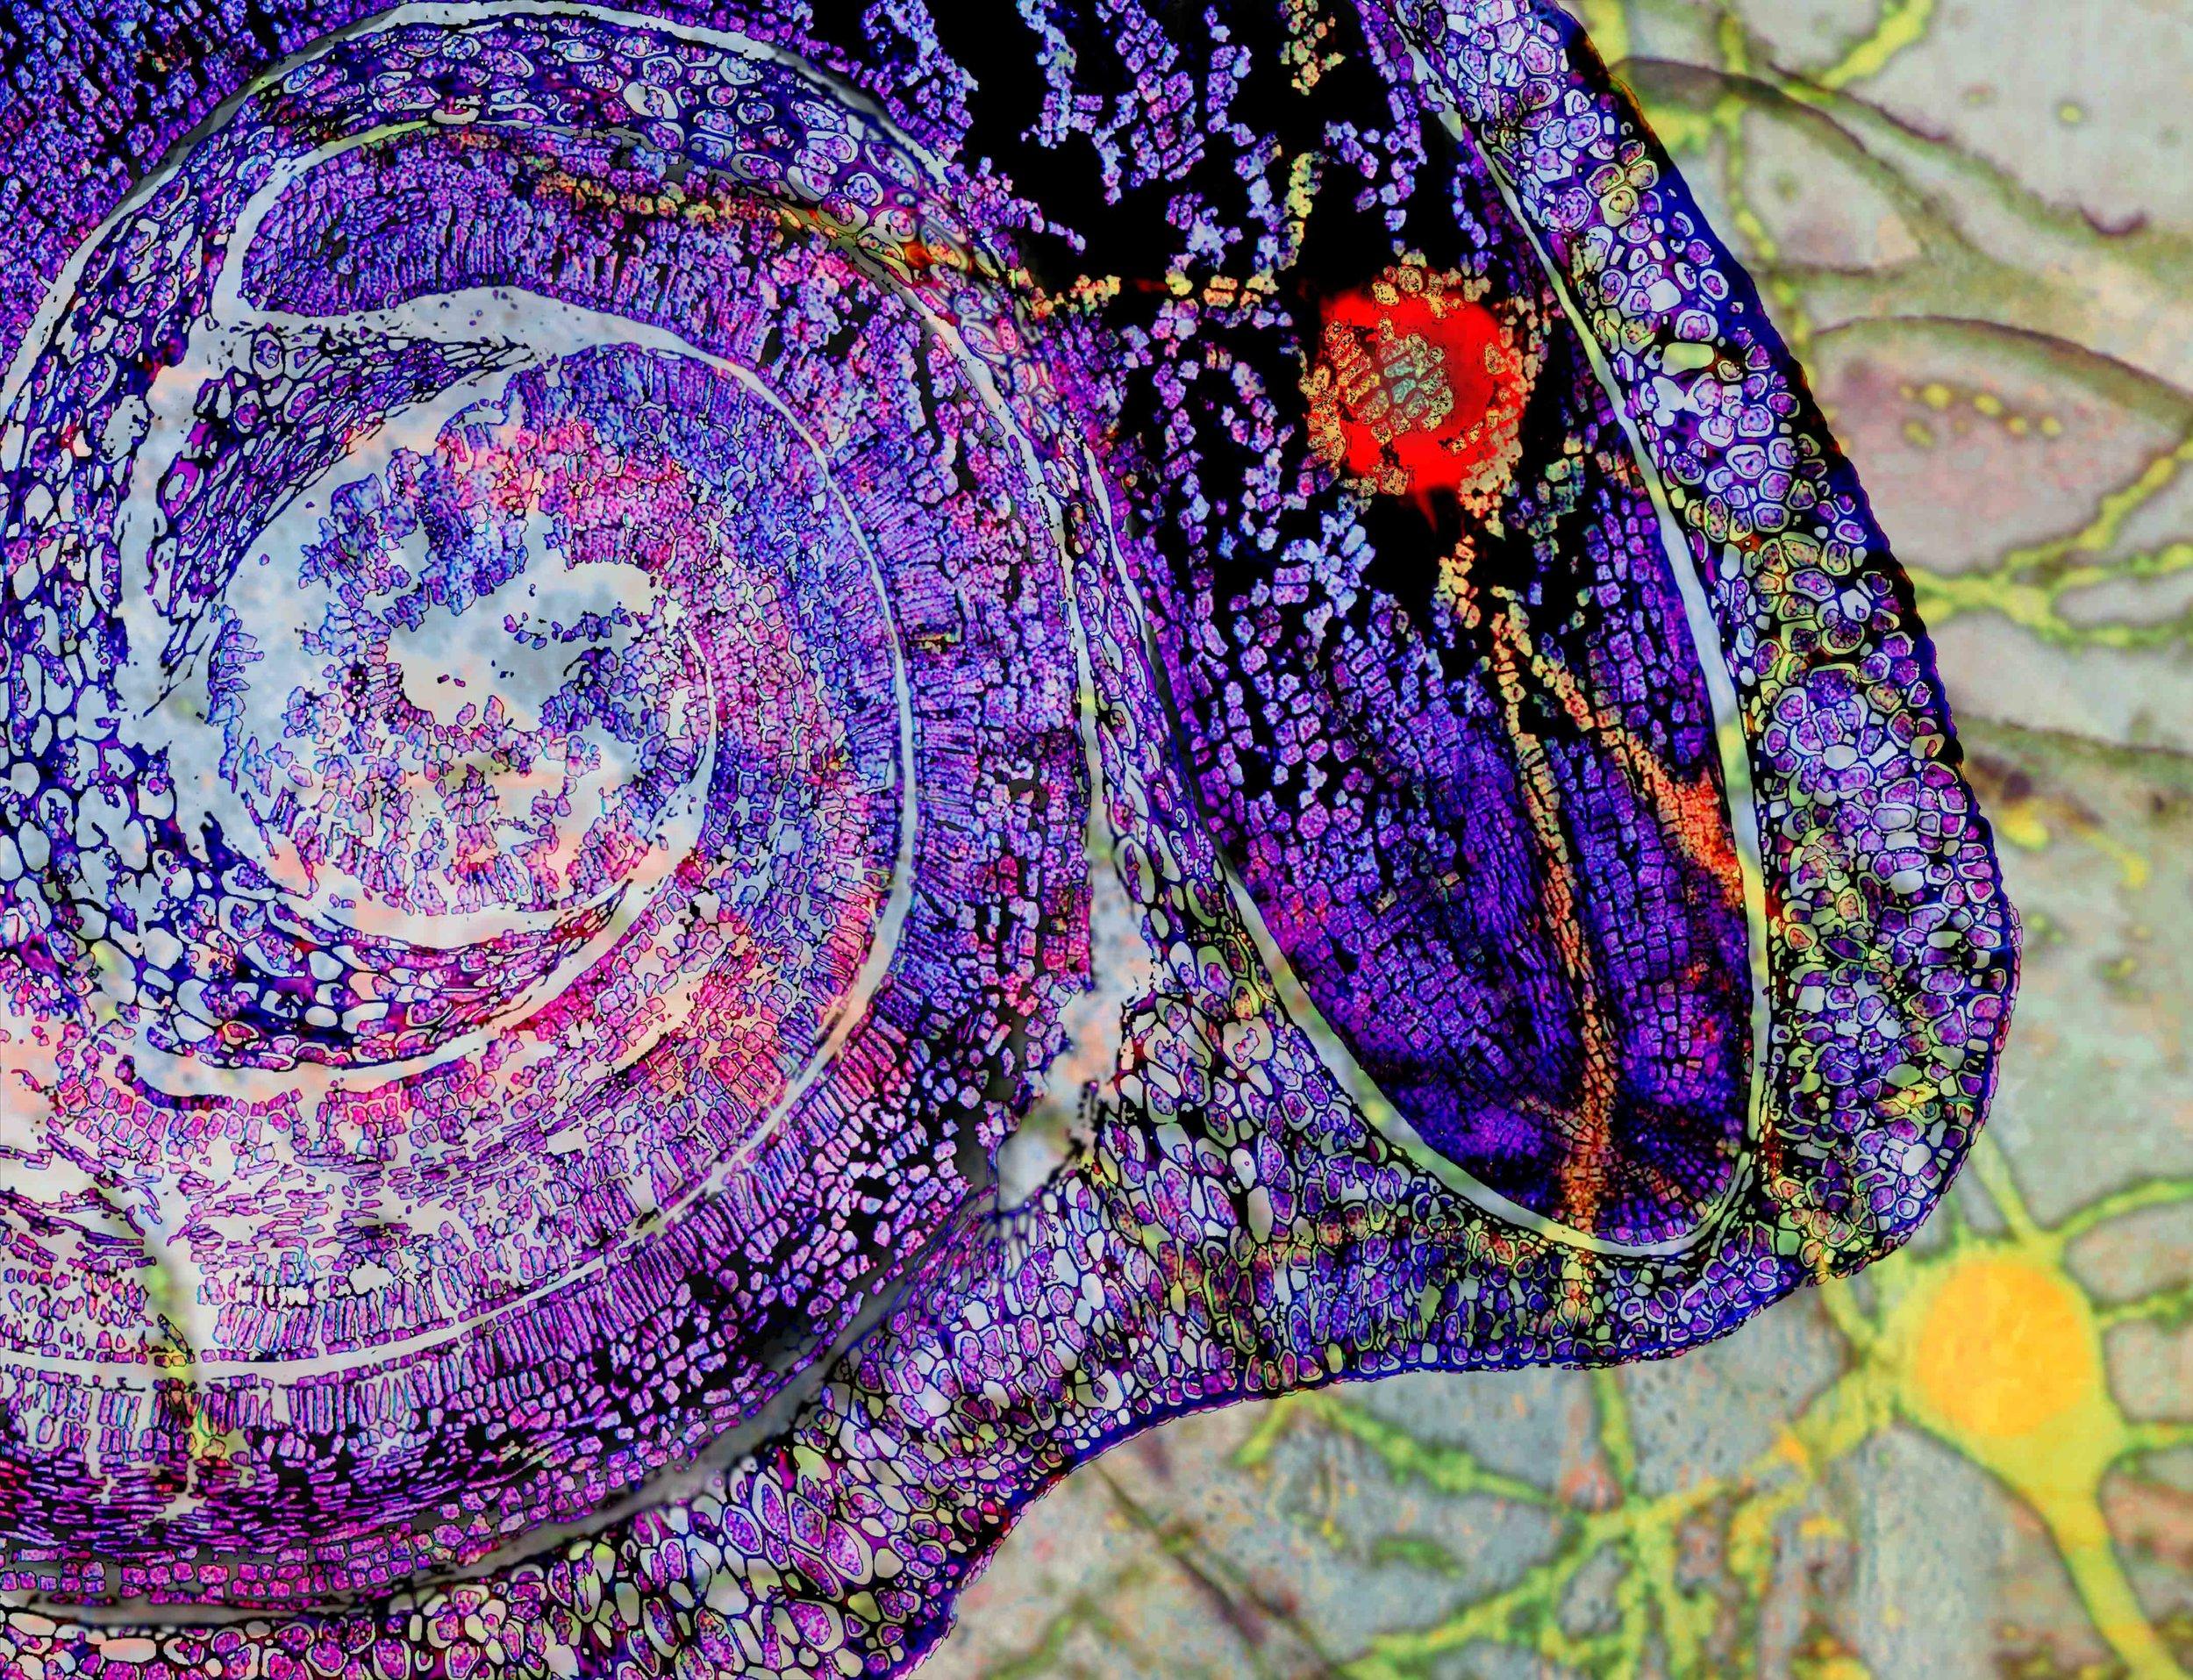 purple snake_layers.jpg